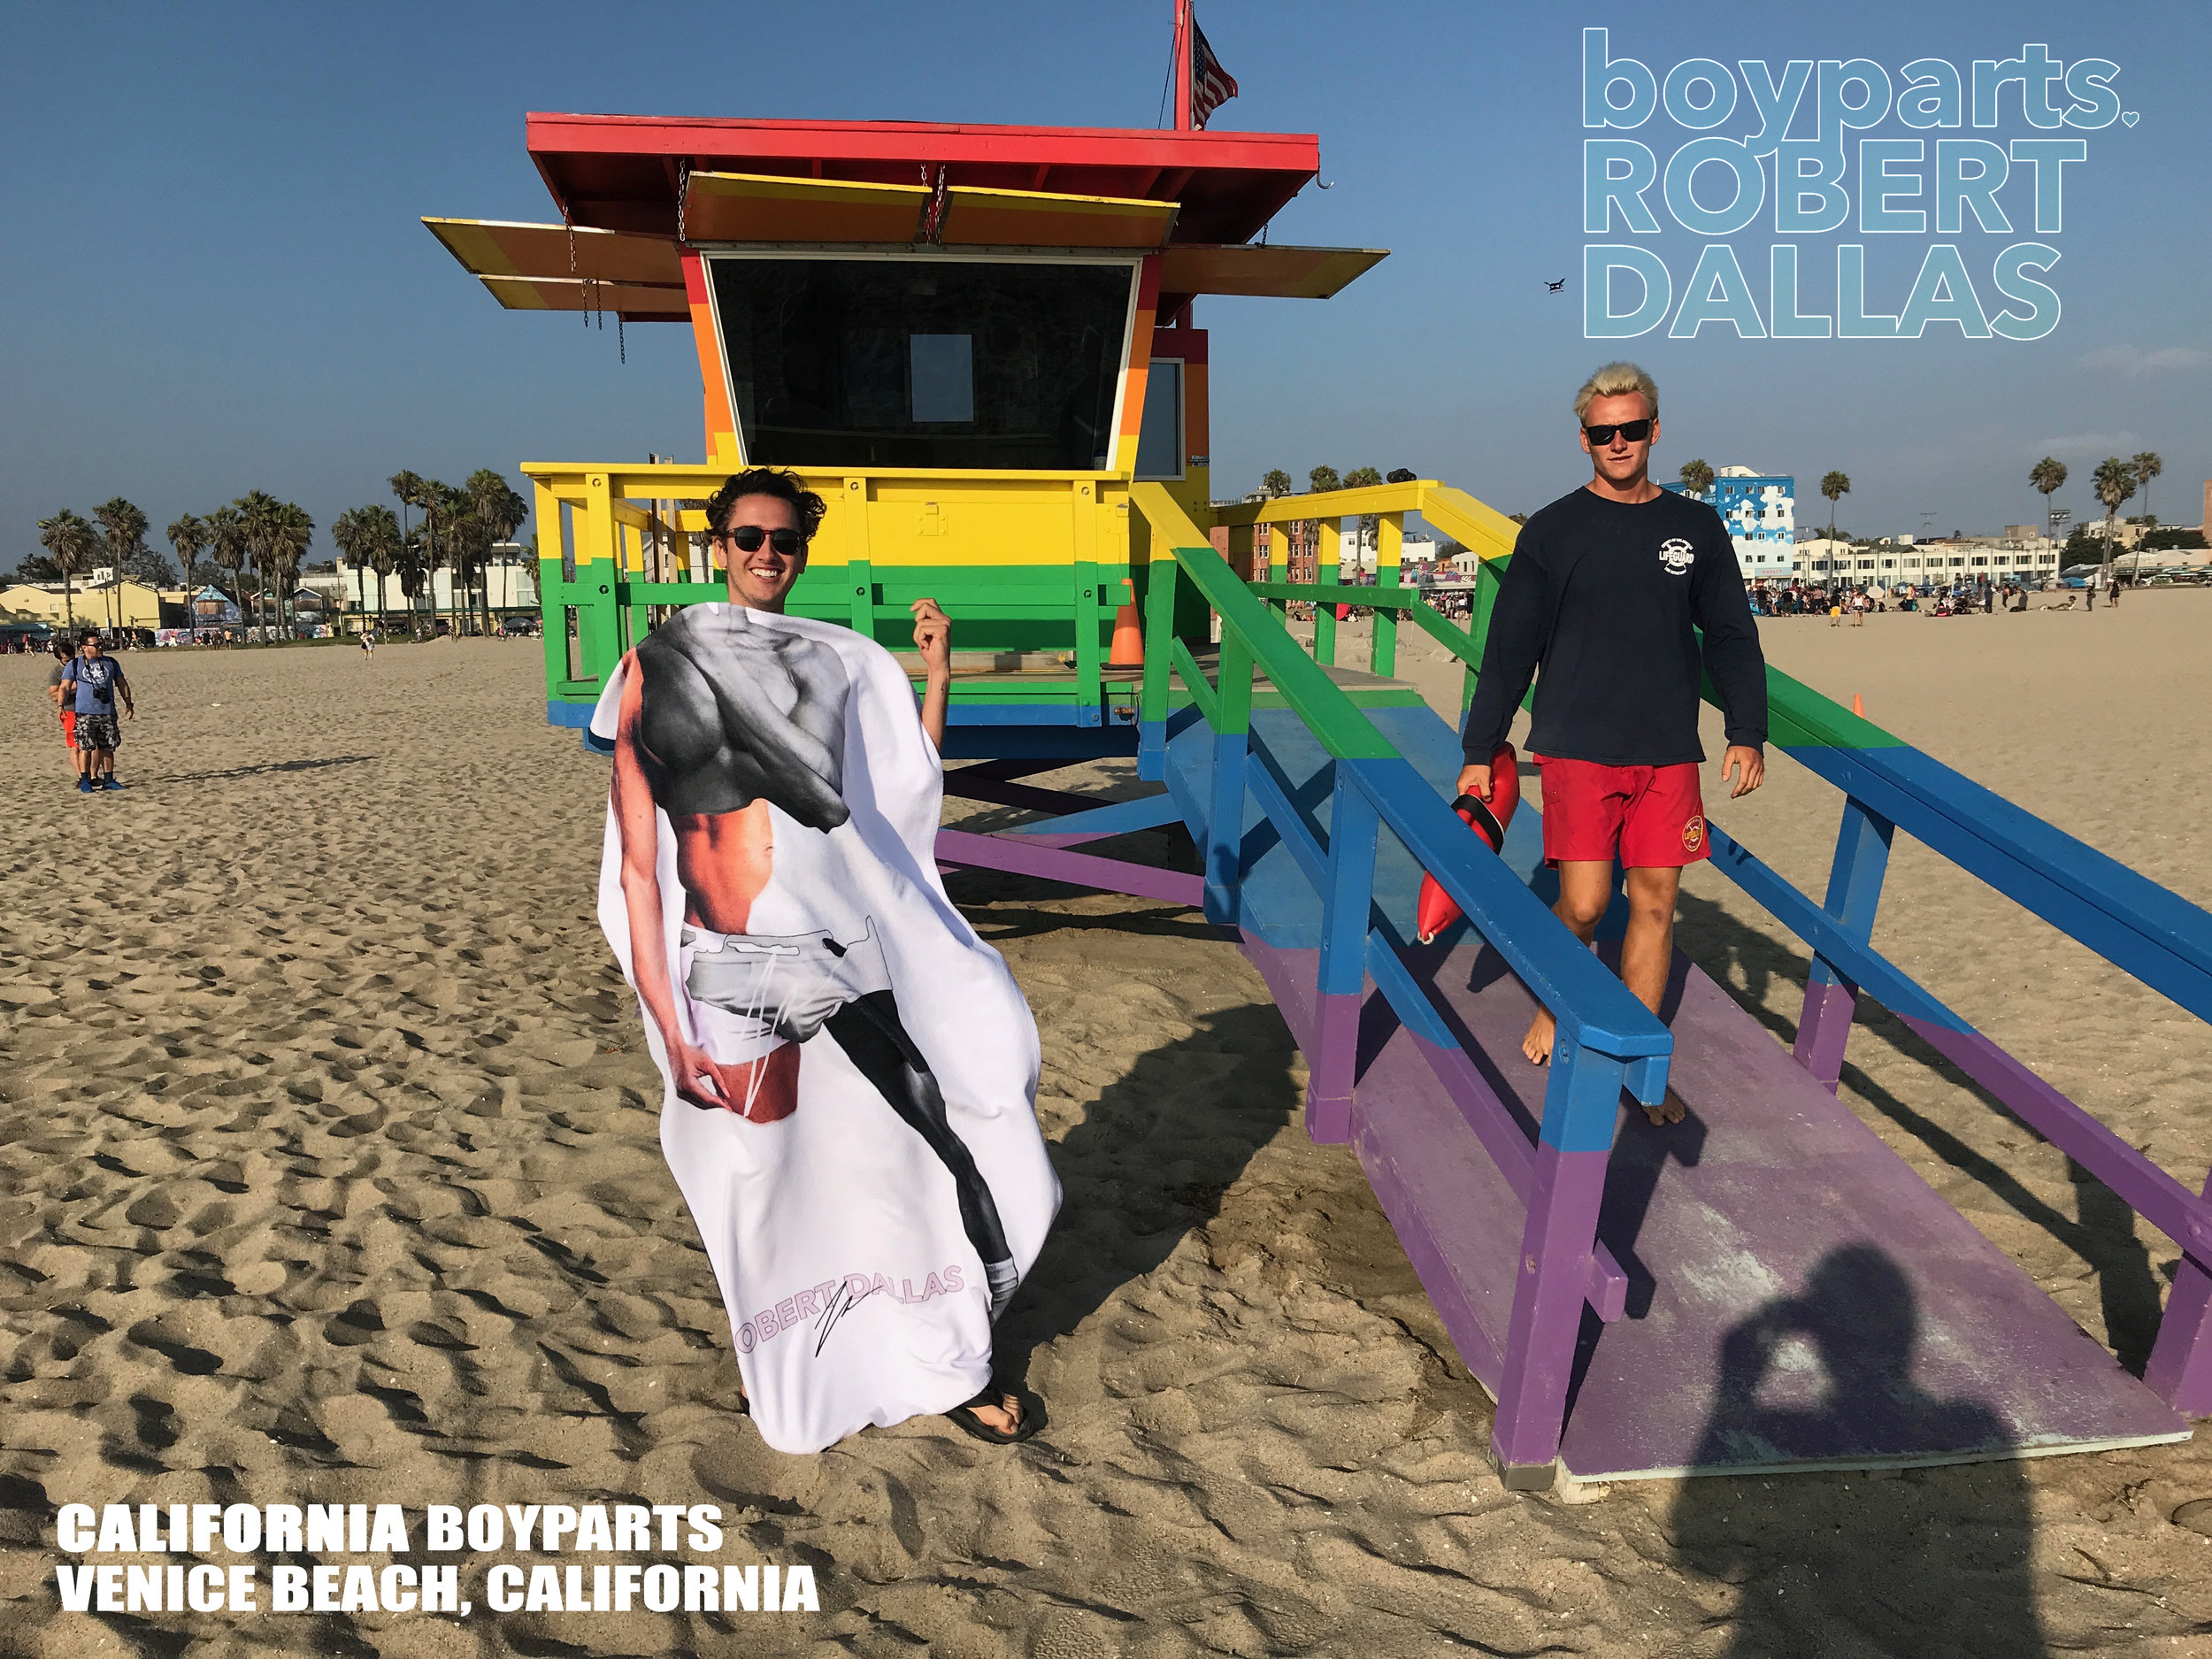 CALIFORNIA BOYPARTS.jpg